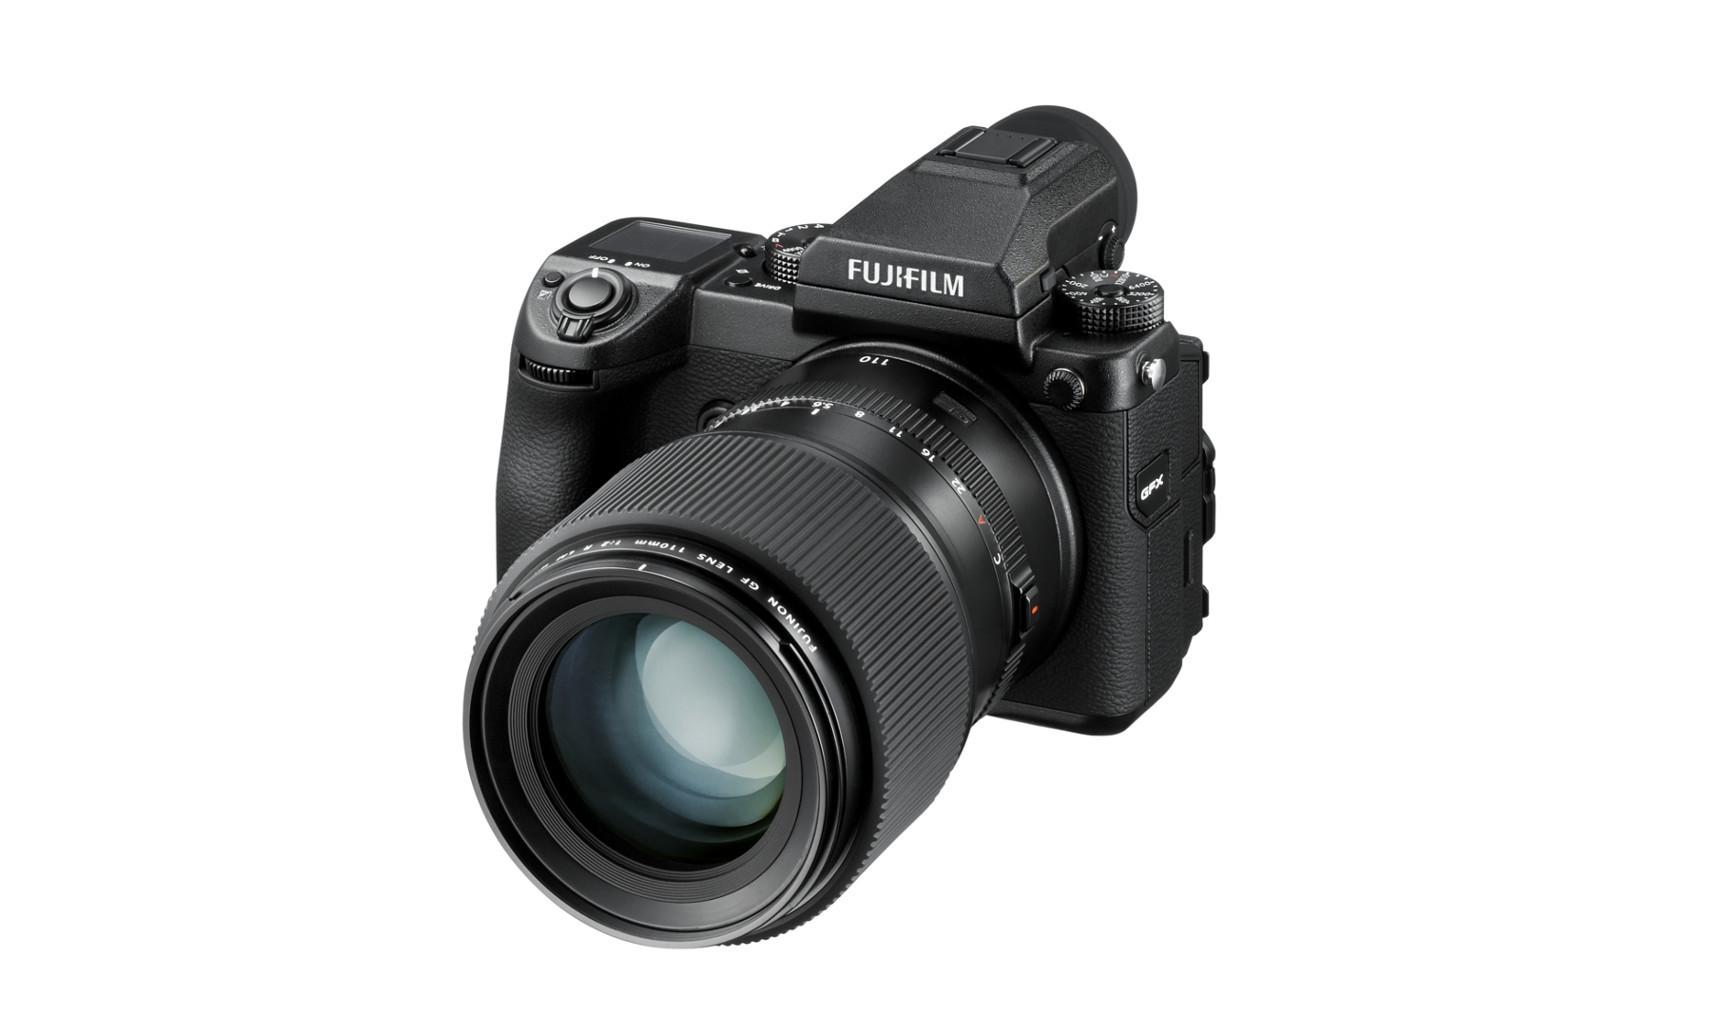 Objektive Und Updates Fr Das Fujifilm Gfx System Ct Fotografie Kipon Nikon G Lens To Camera Adapter